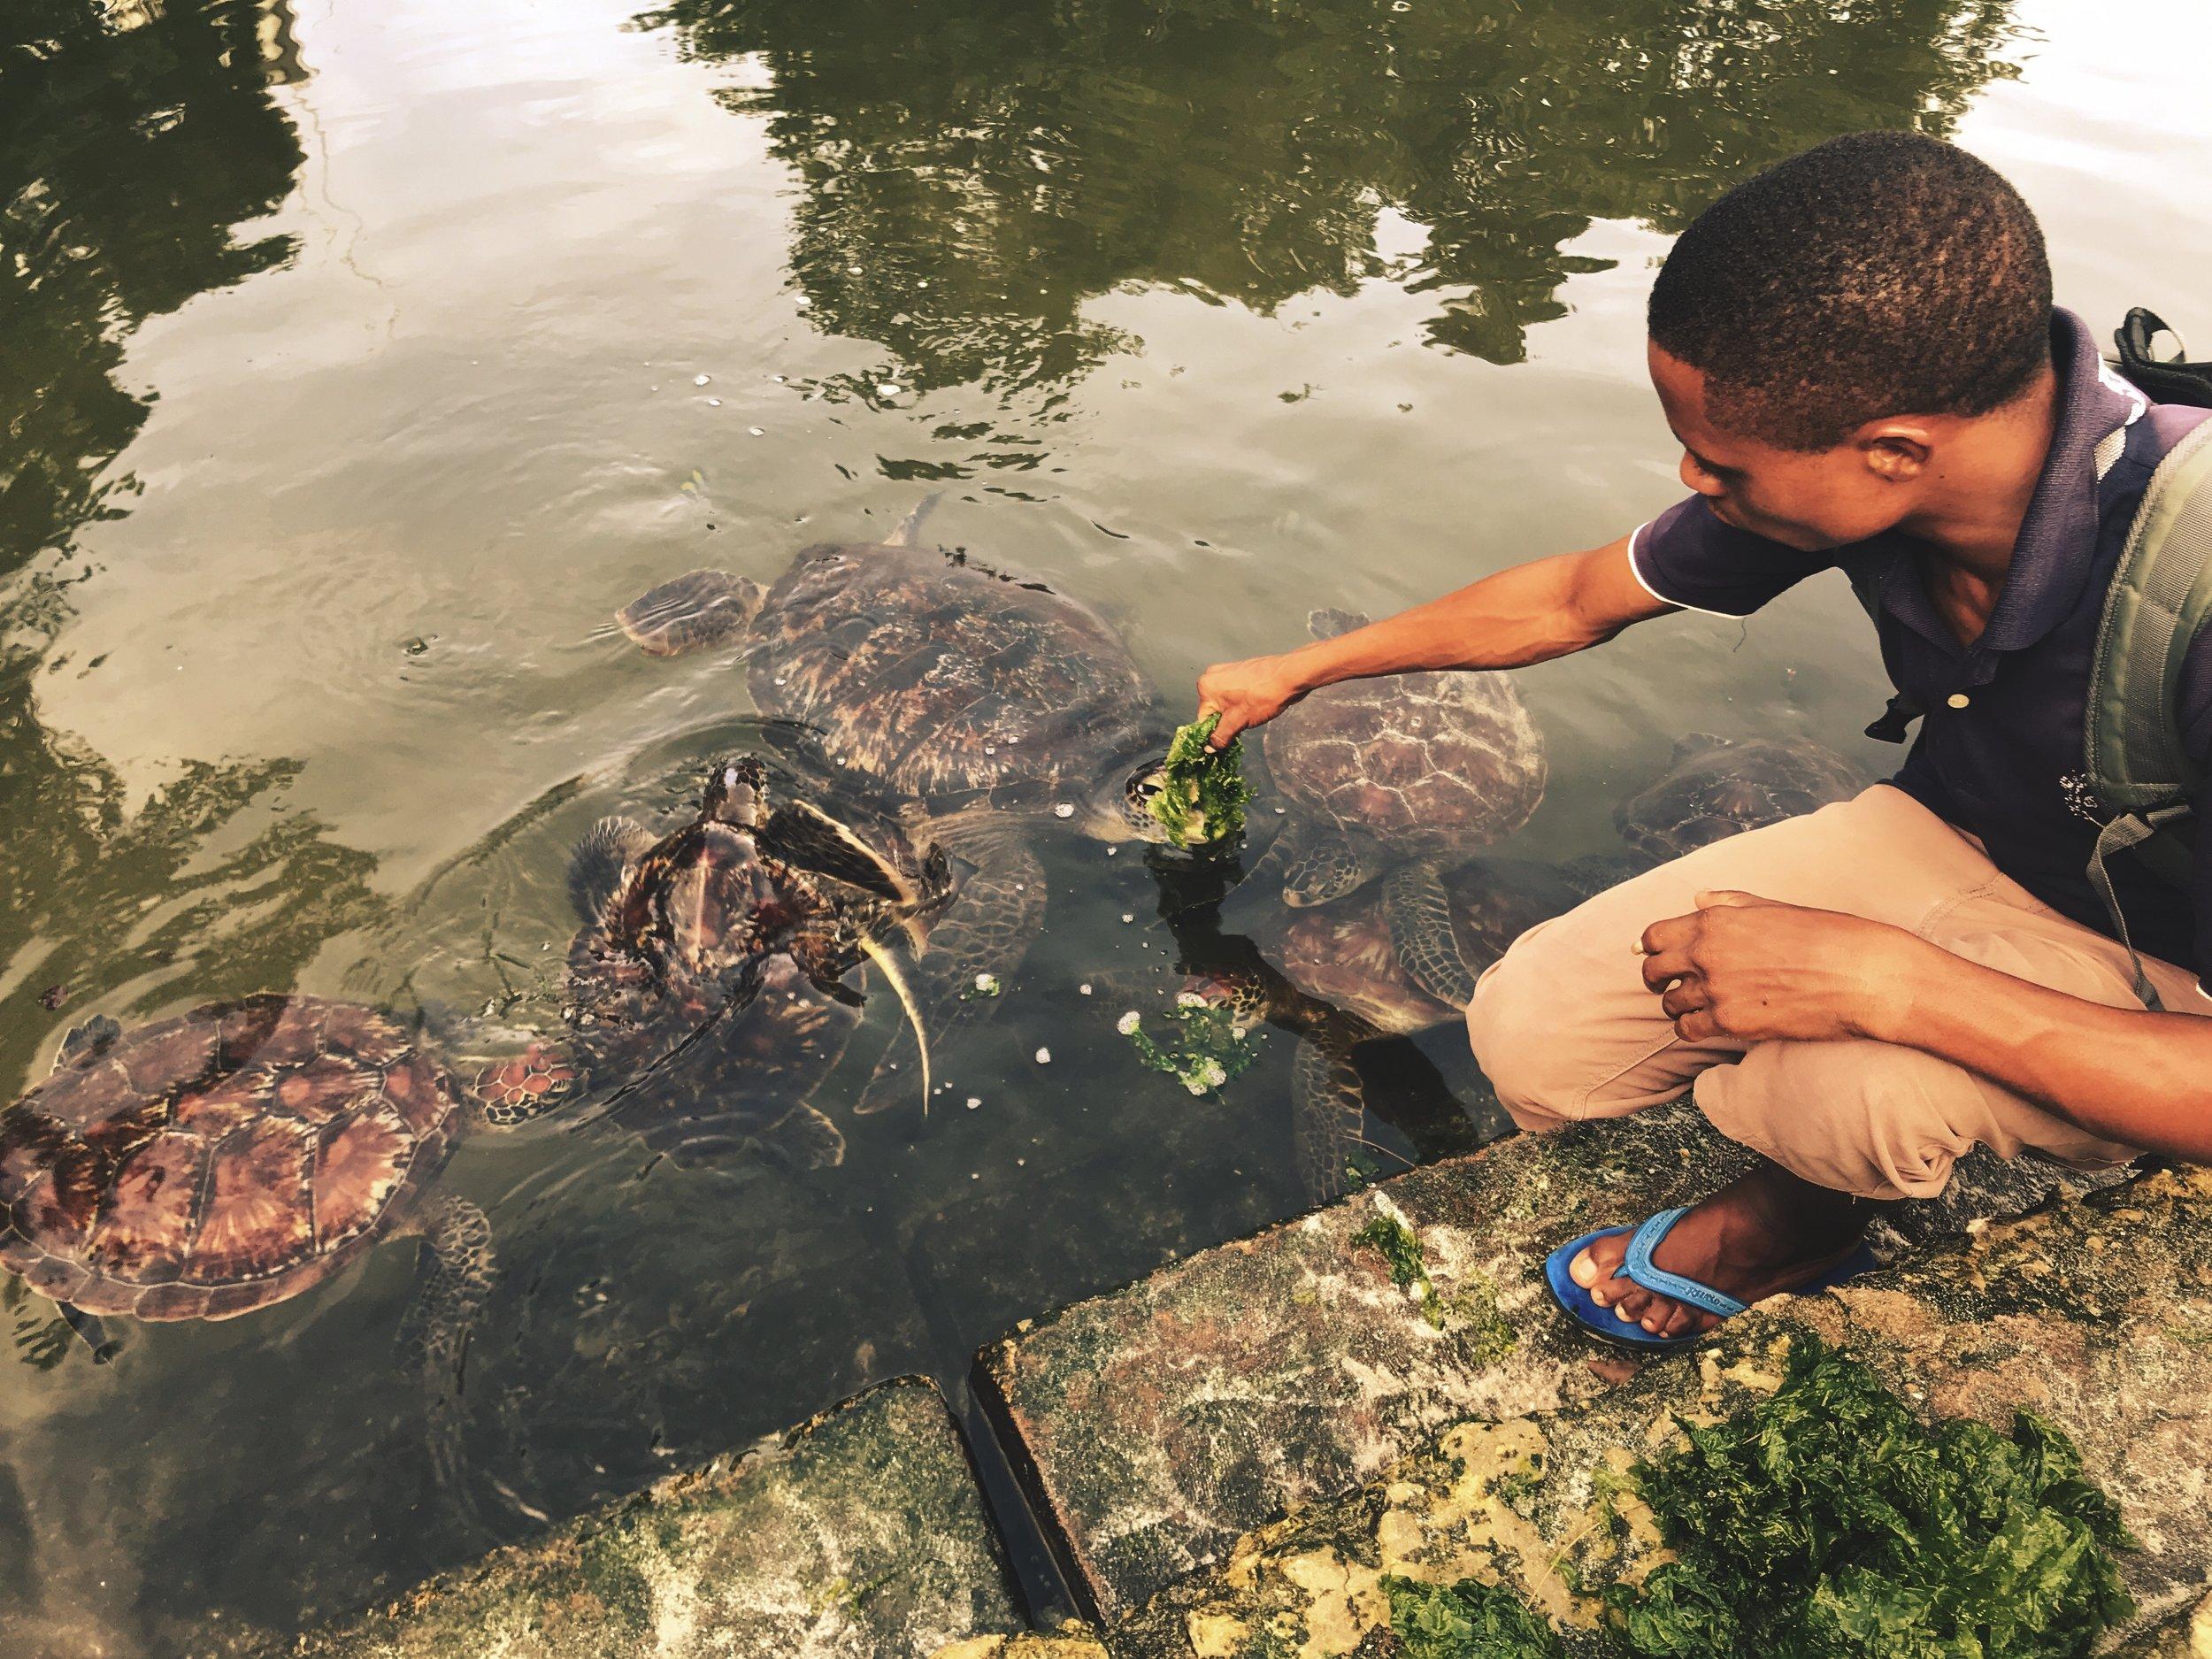 Moses feeding the turtles